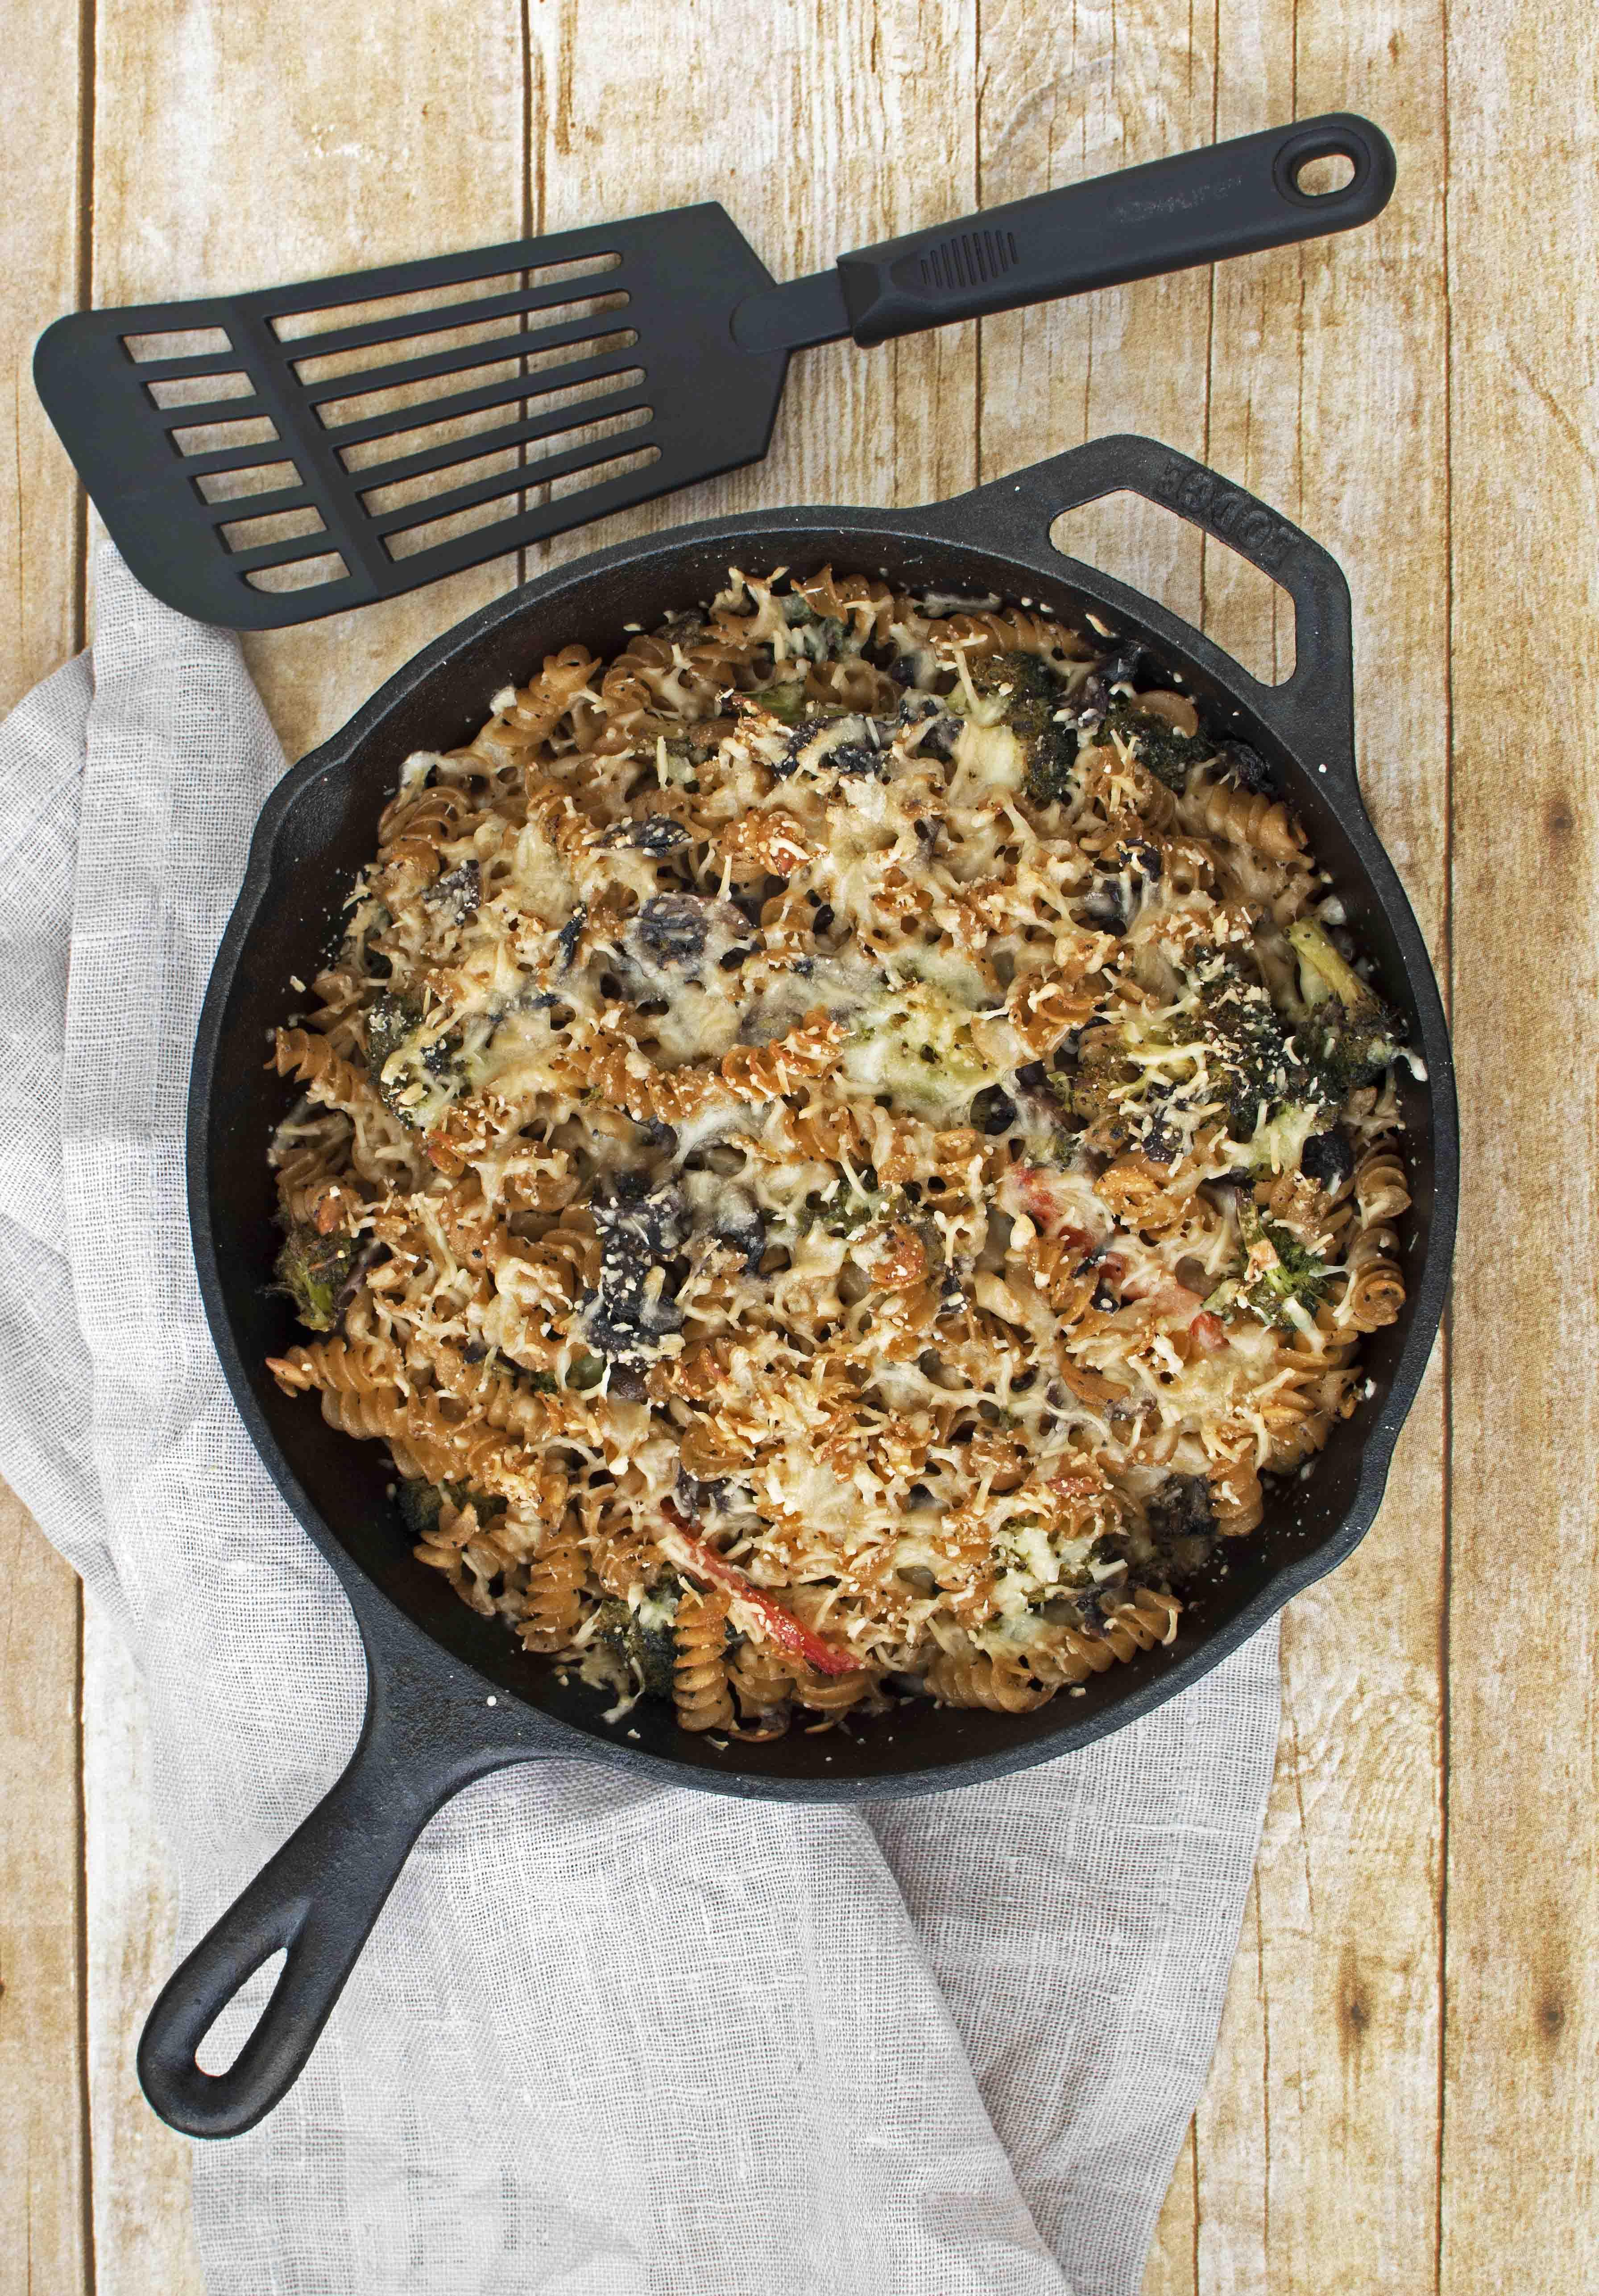 Baked Wheat Pasta with Mushrooms, Broccoli and Bell Peppers - Pepper Delight #pepperdelightblog #recipe #pasta #baked #vegeterian #meatlesspasta